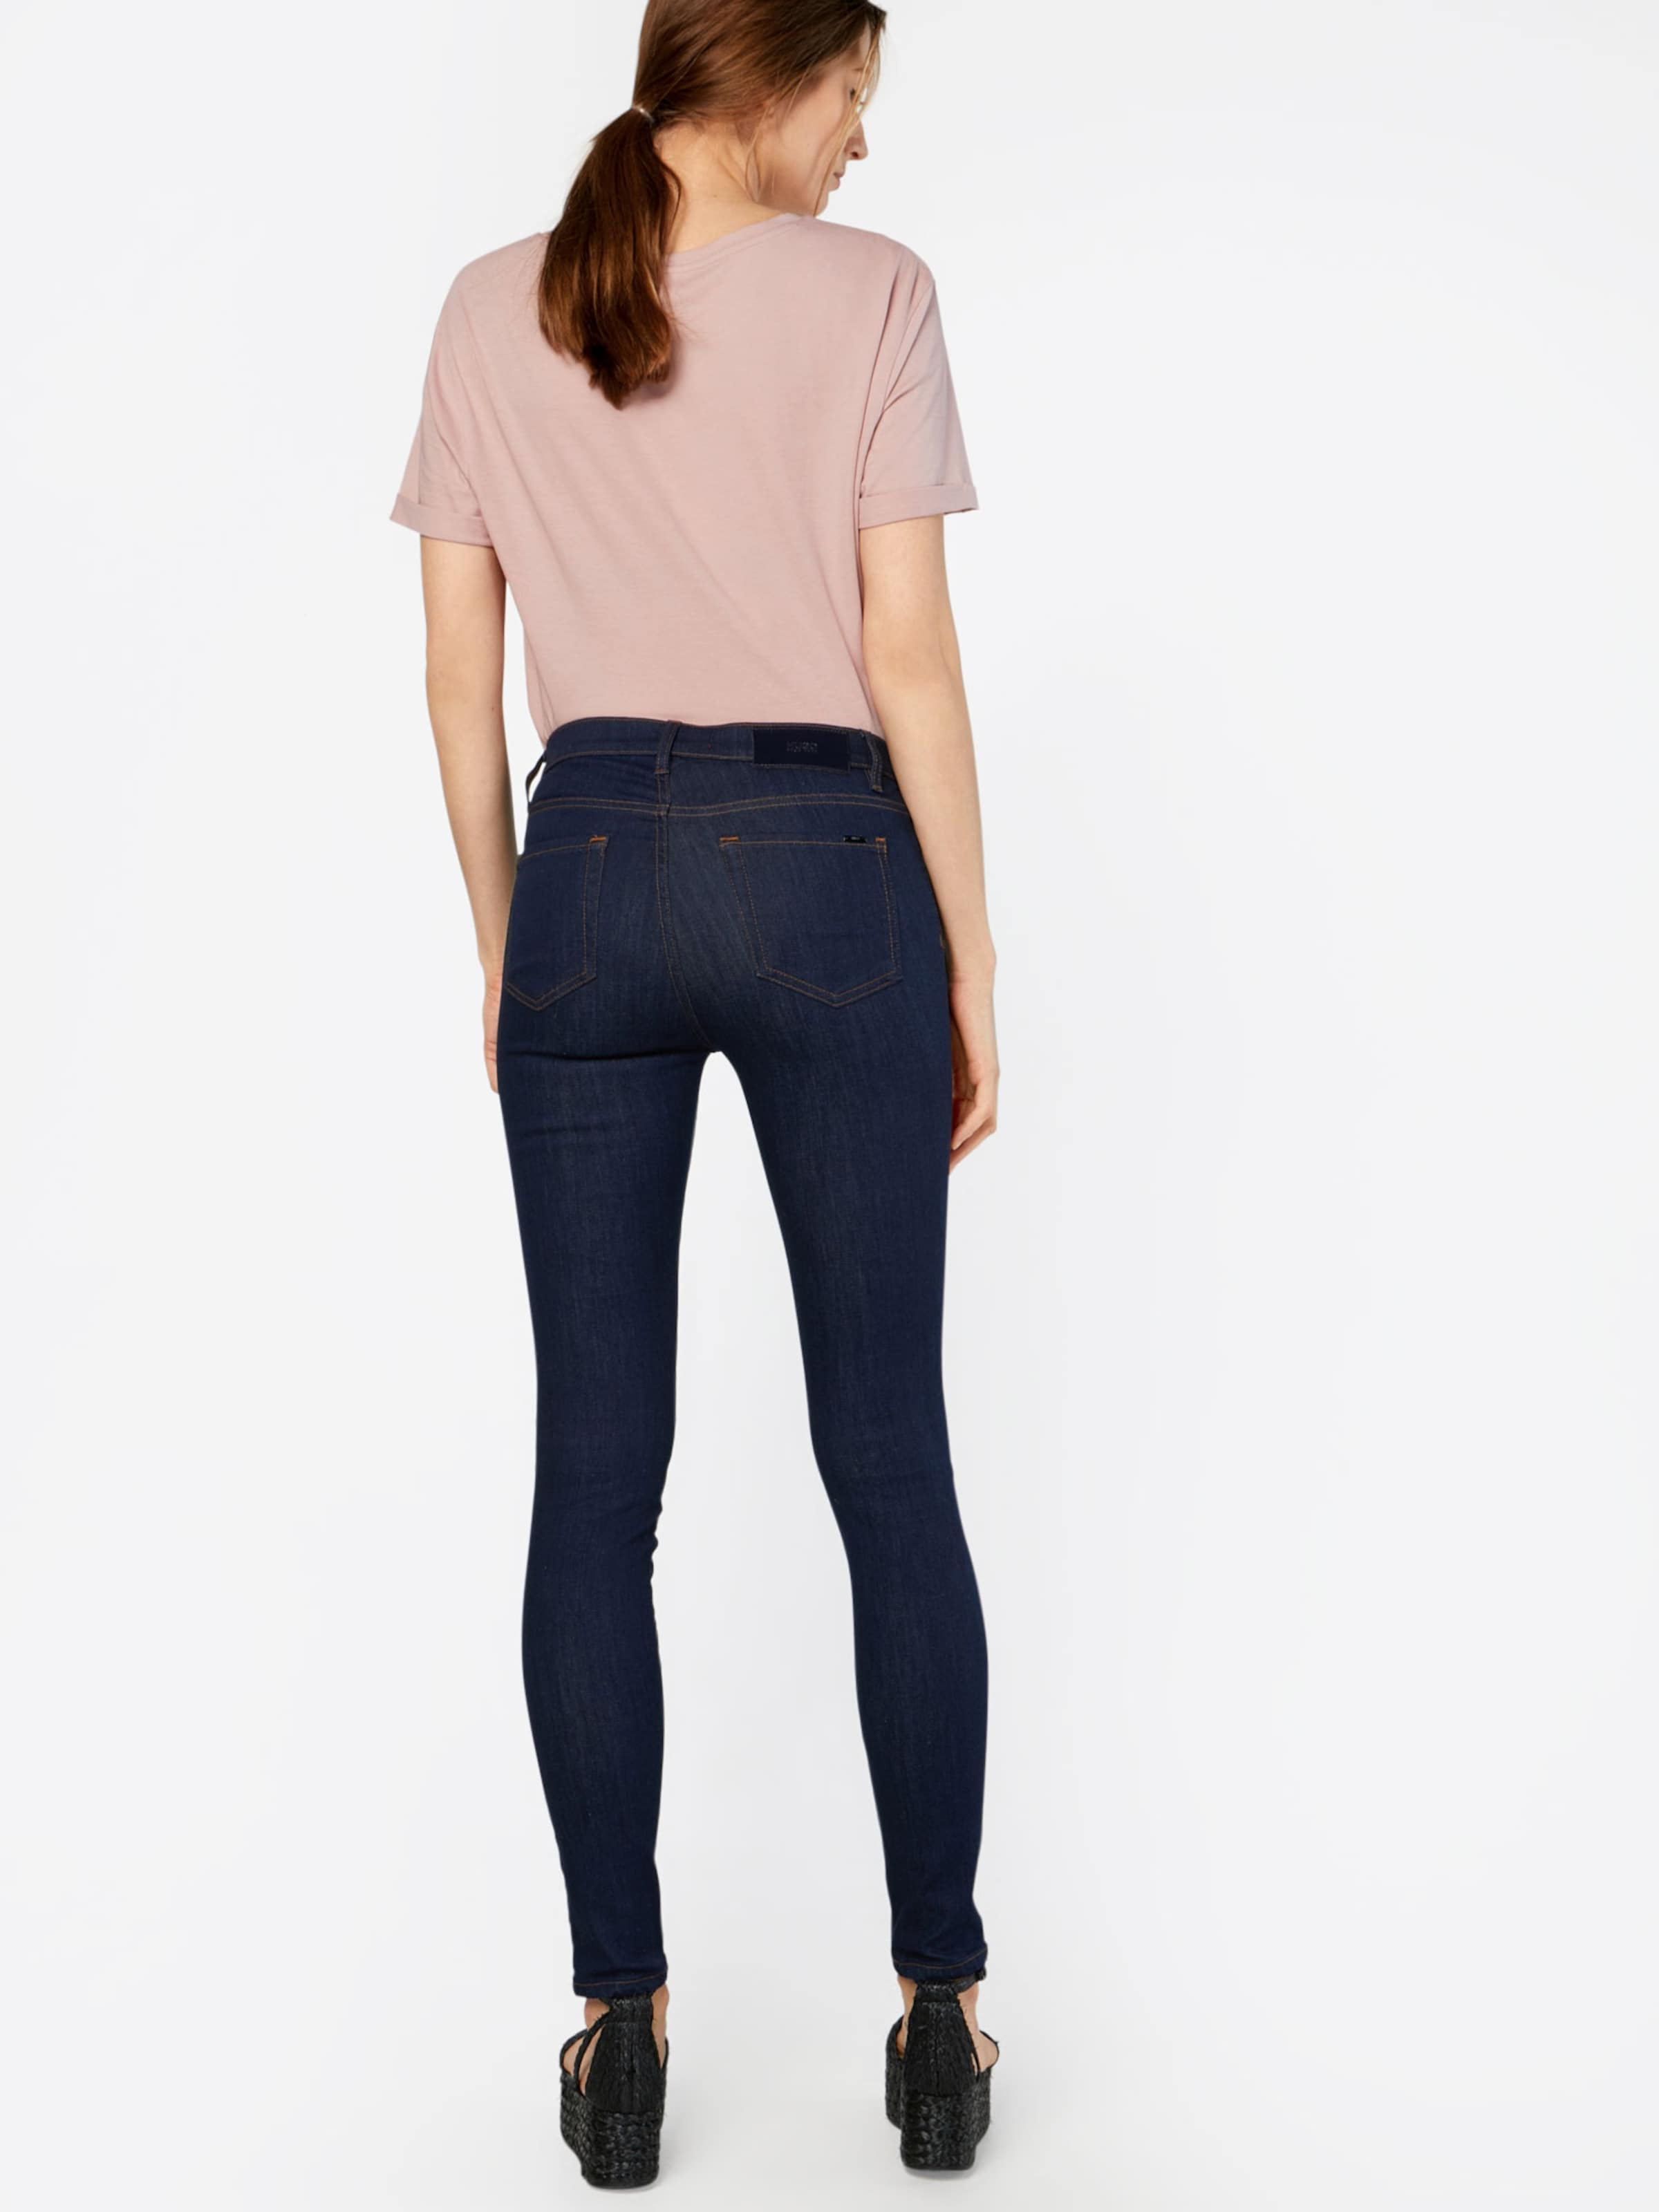 HUGO Jeans 'Georgina' Steckdose In Deutschland ODu9Dchw